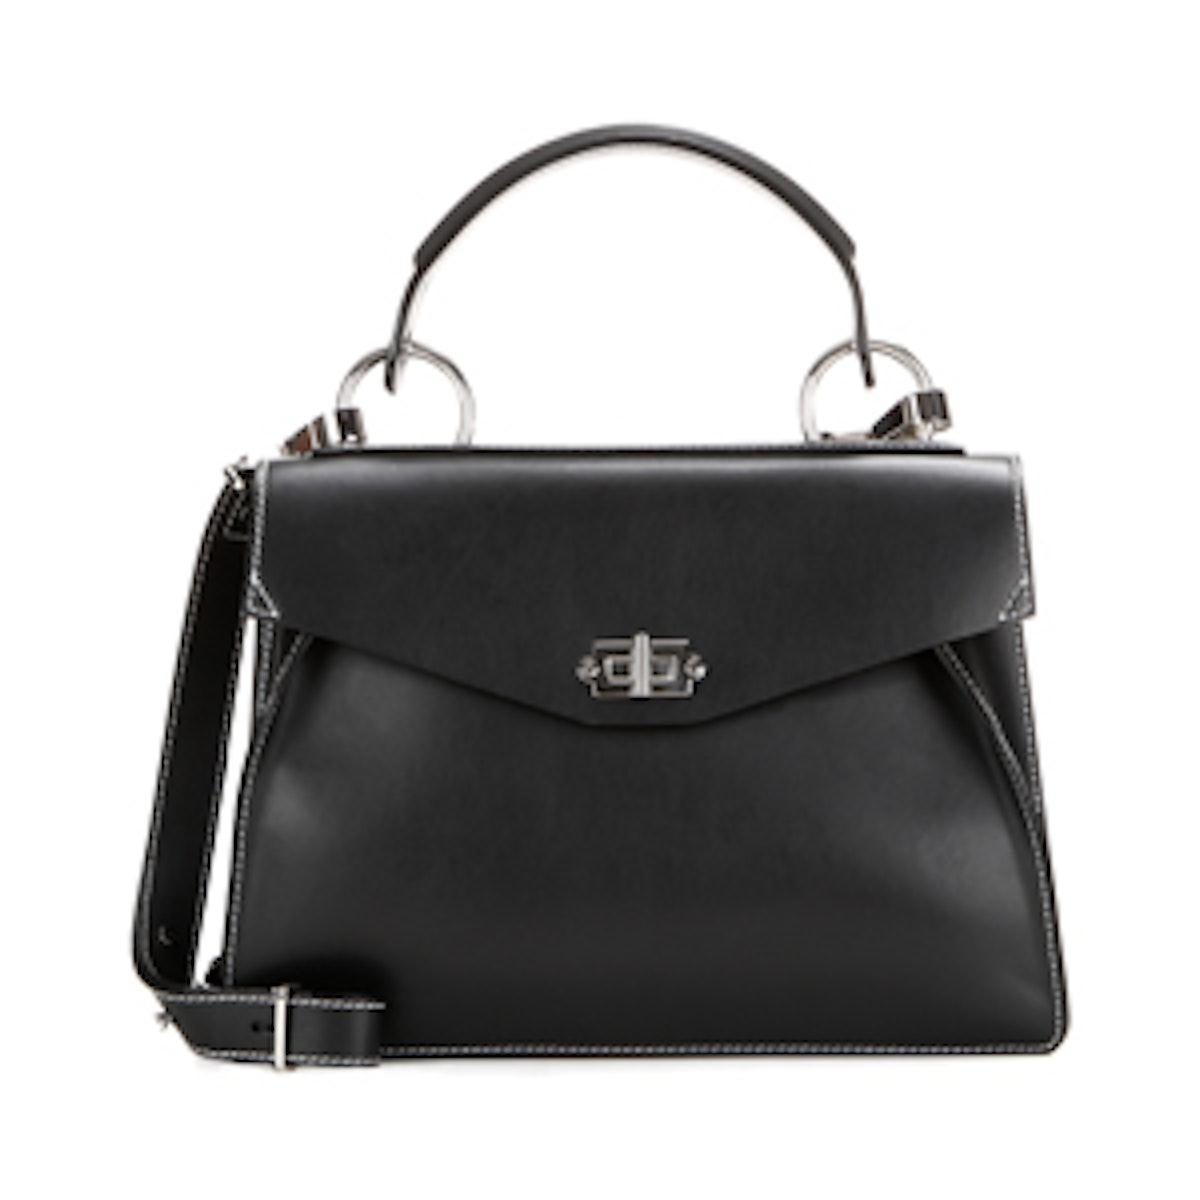 Medium Hava Leather Cross-Body Bag